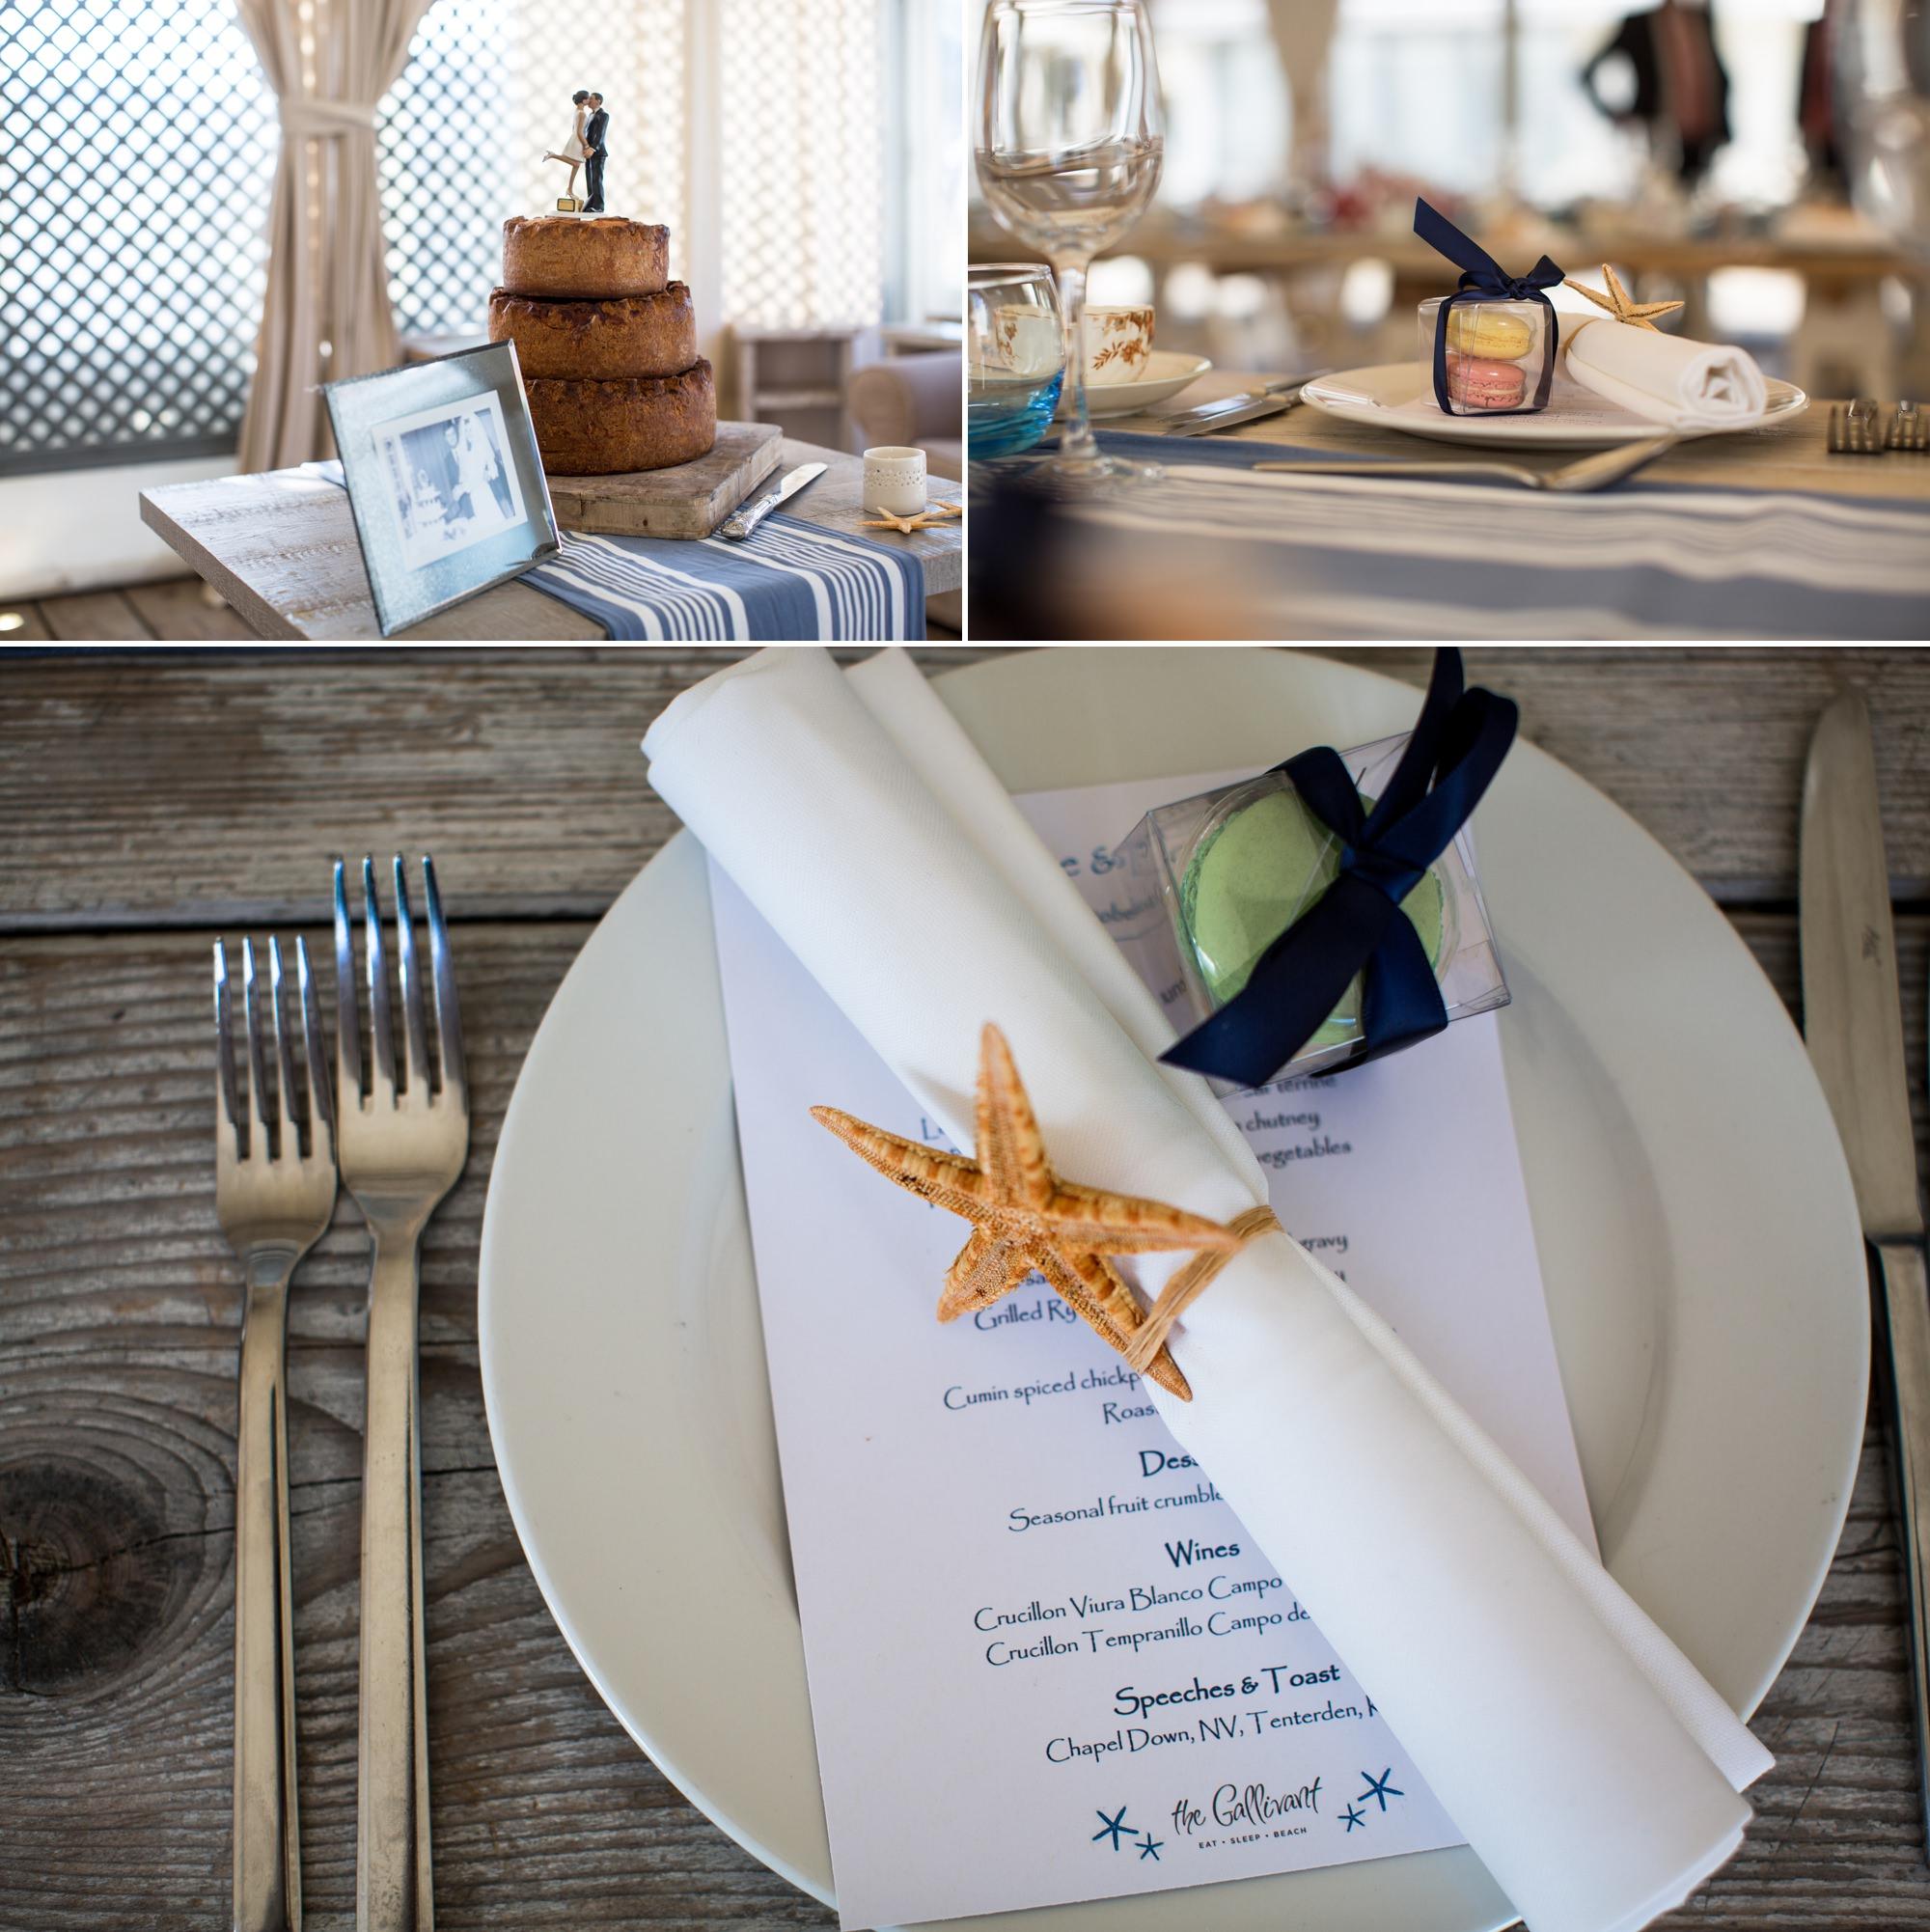 the-gallivant-wedding-4